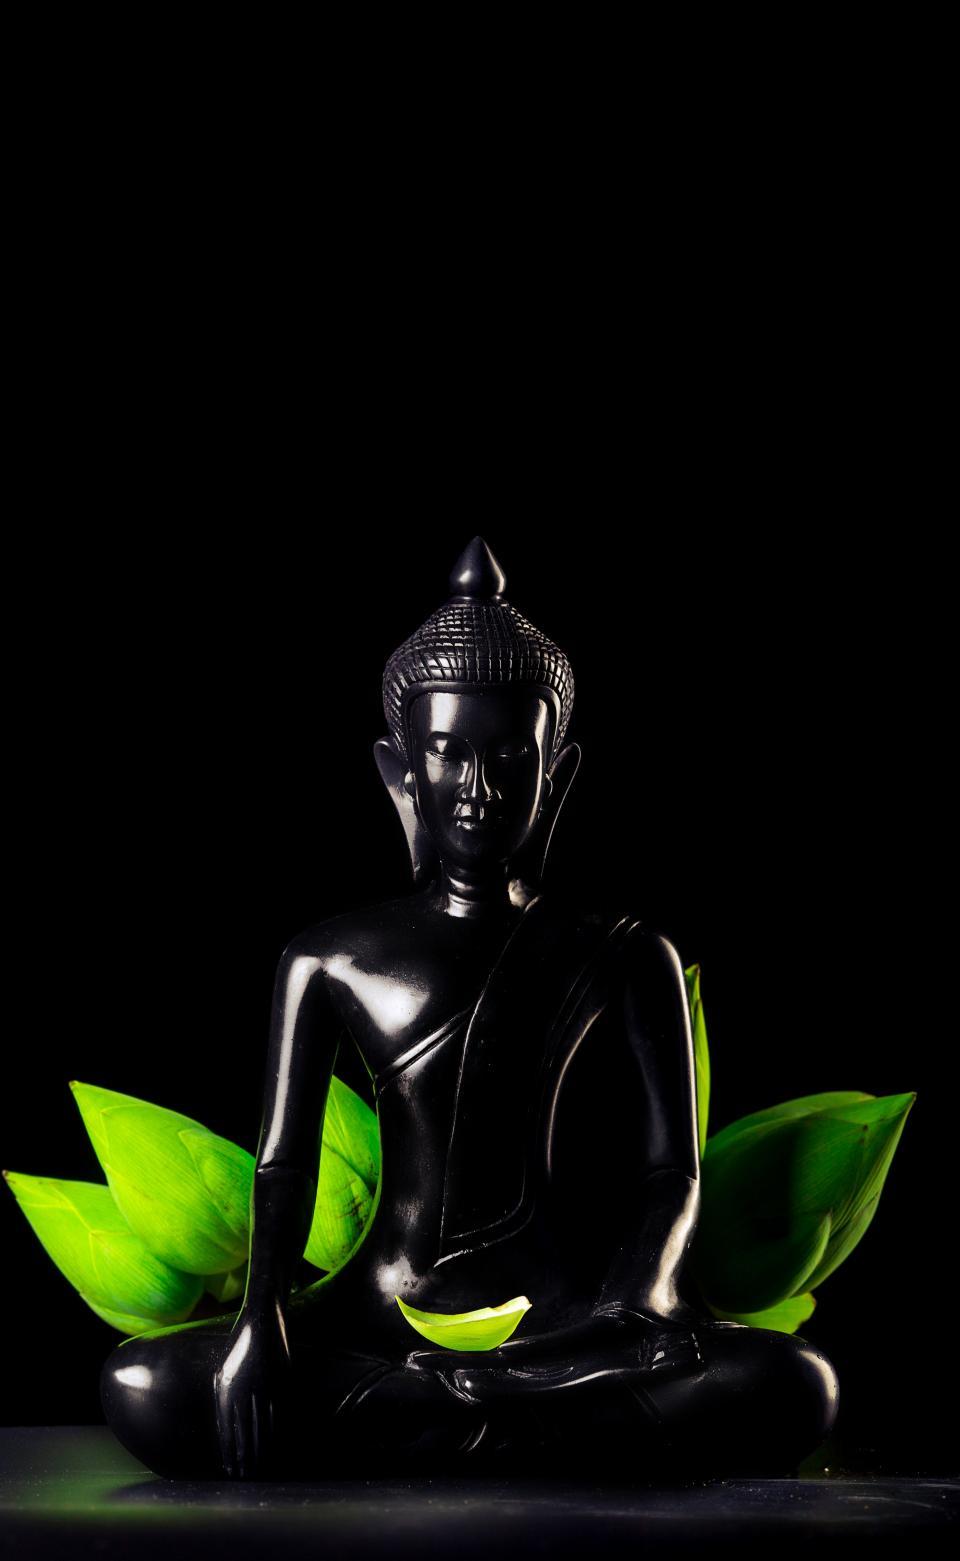 dark, black, ceramic, sculpture, statue, figure, art, design, display, buddha